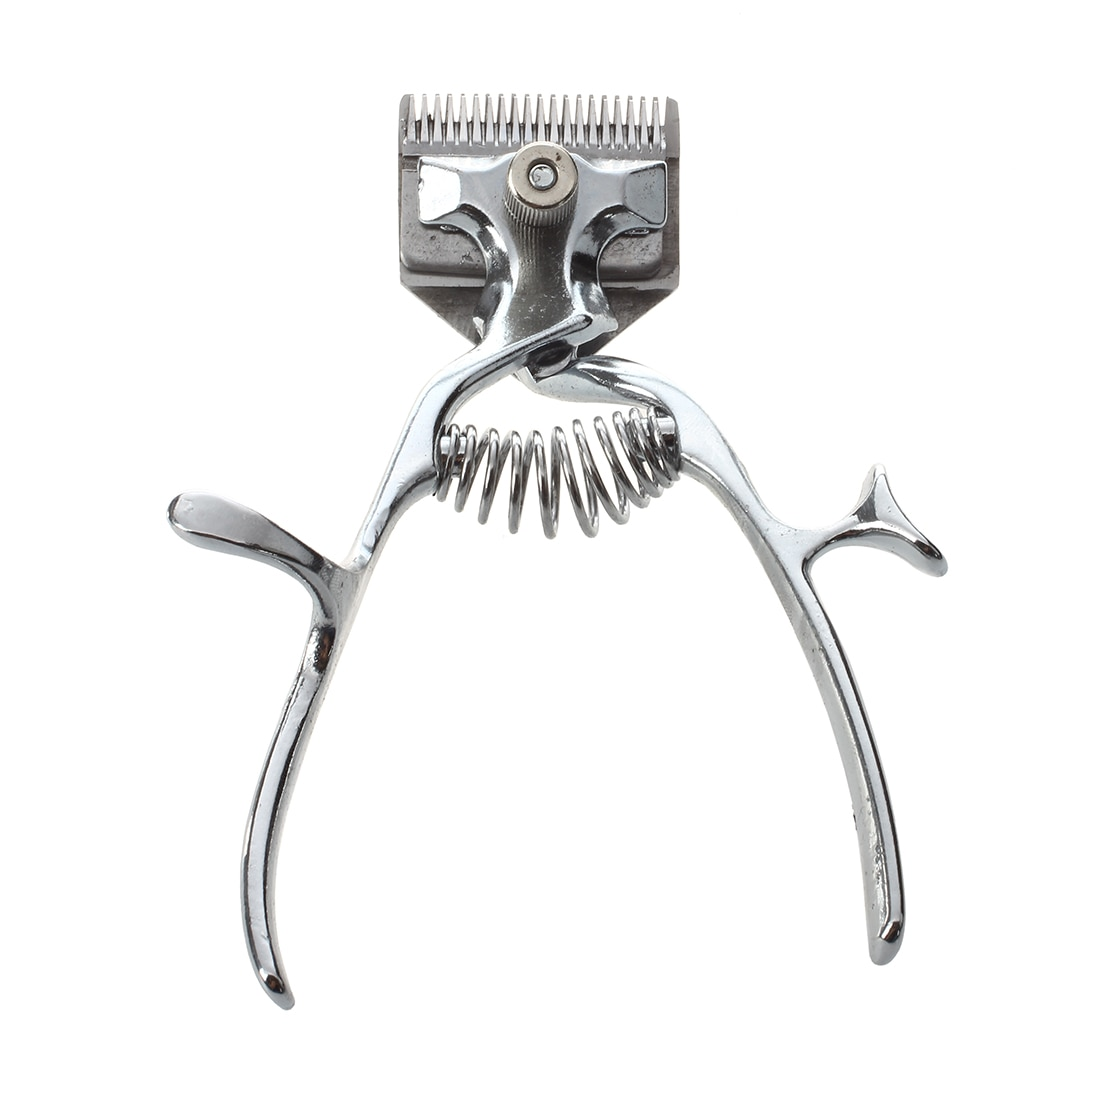 Cortadora de pelo Manual de Moda Antigua, cortadora de pelo no eléctrica de poco ruido